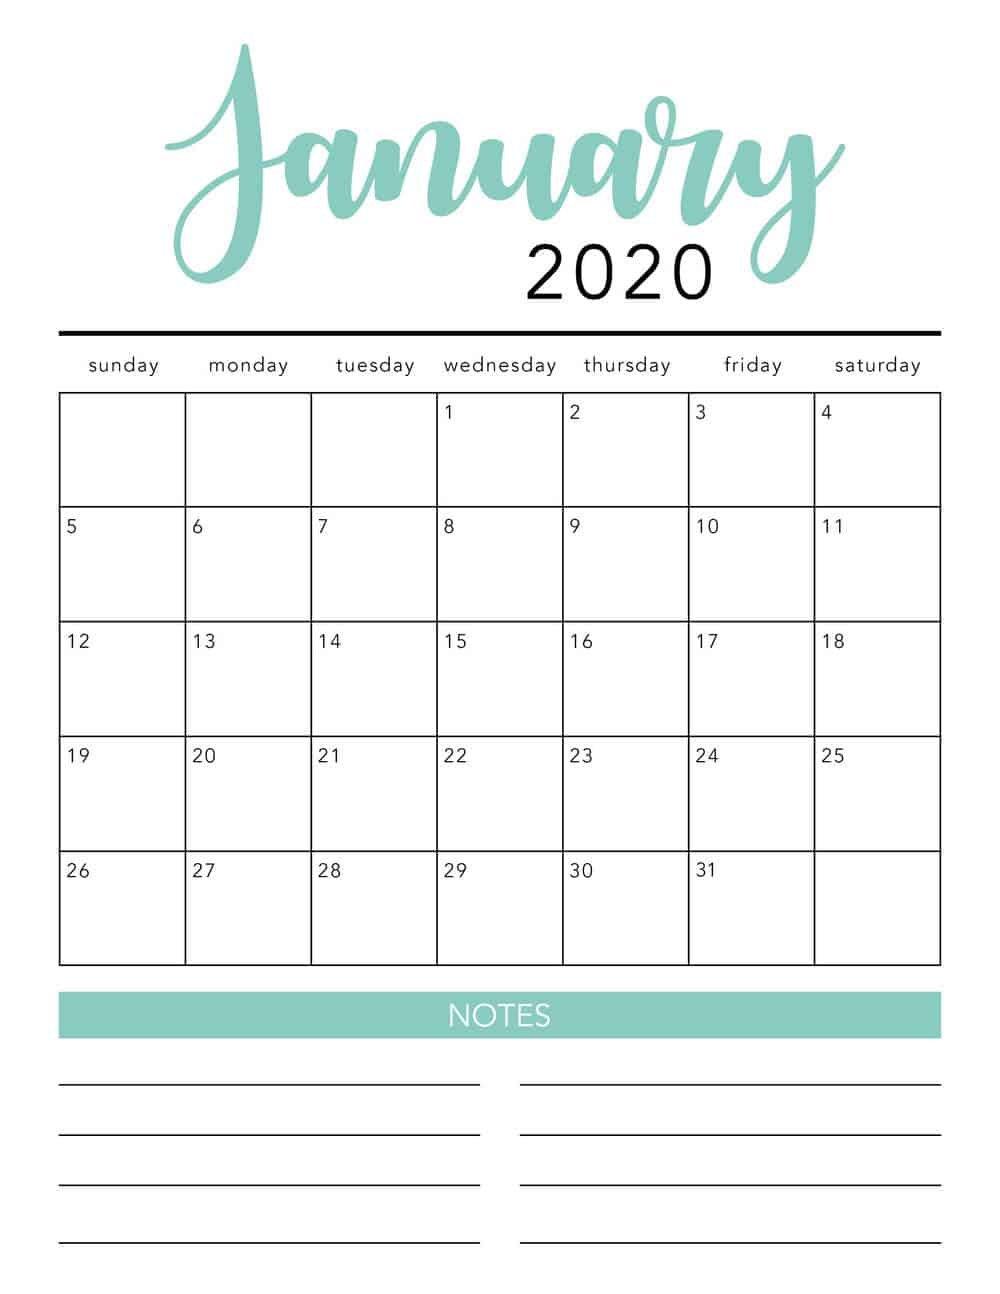 Free 2020 Printable Calendar Template (2 Colors!) - I 12 Month Editable Calendar